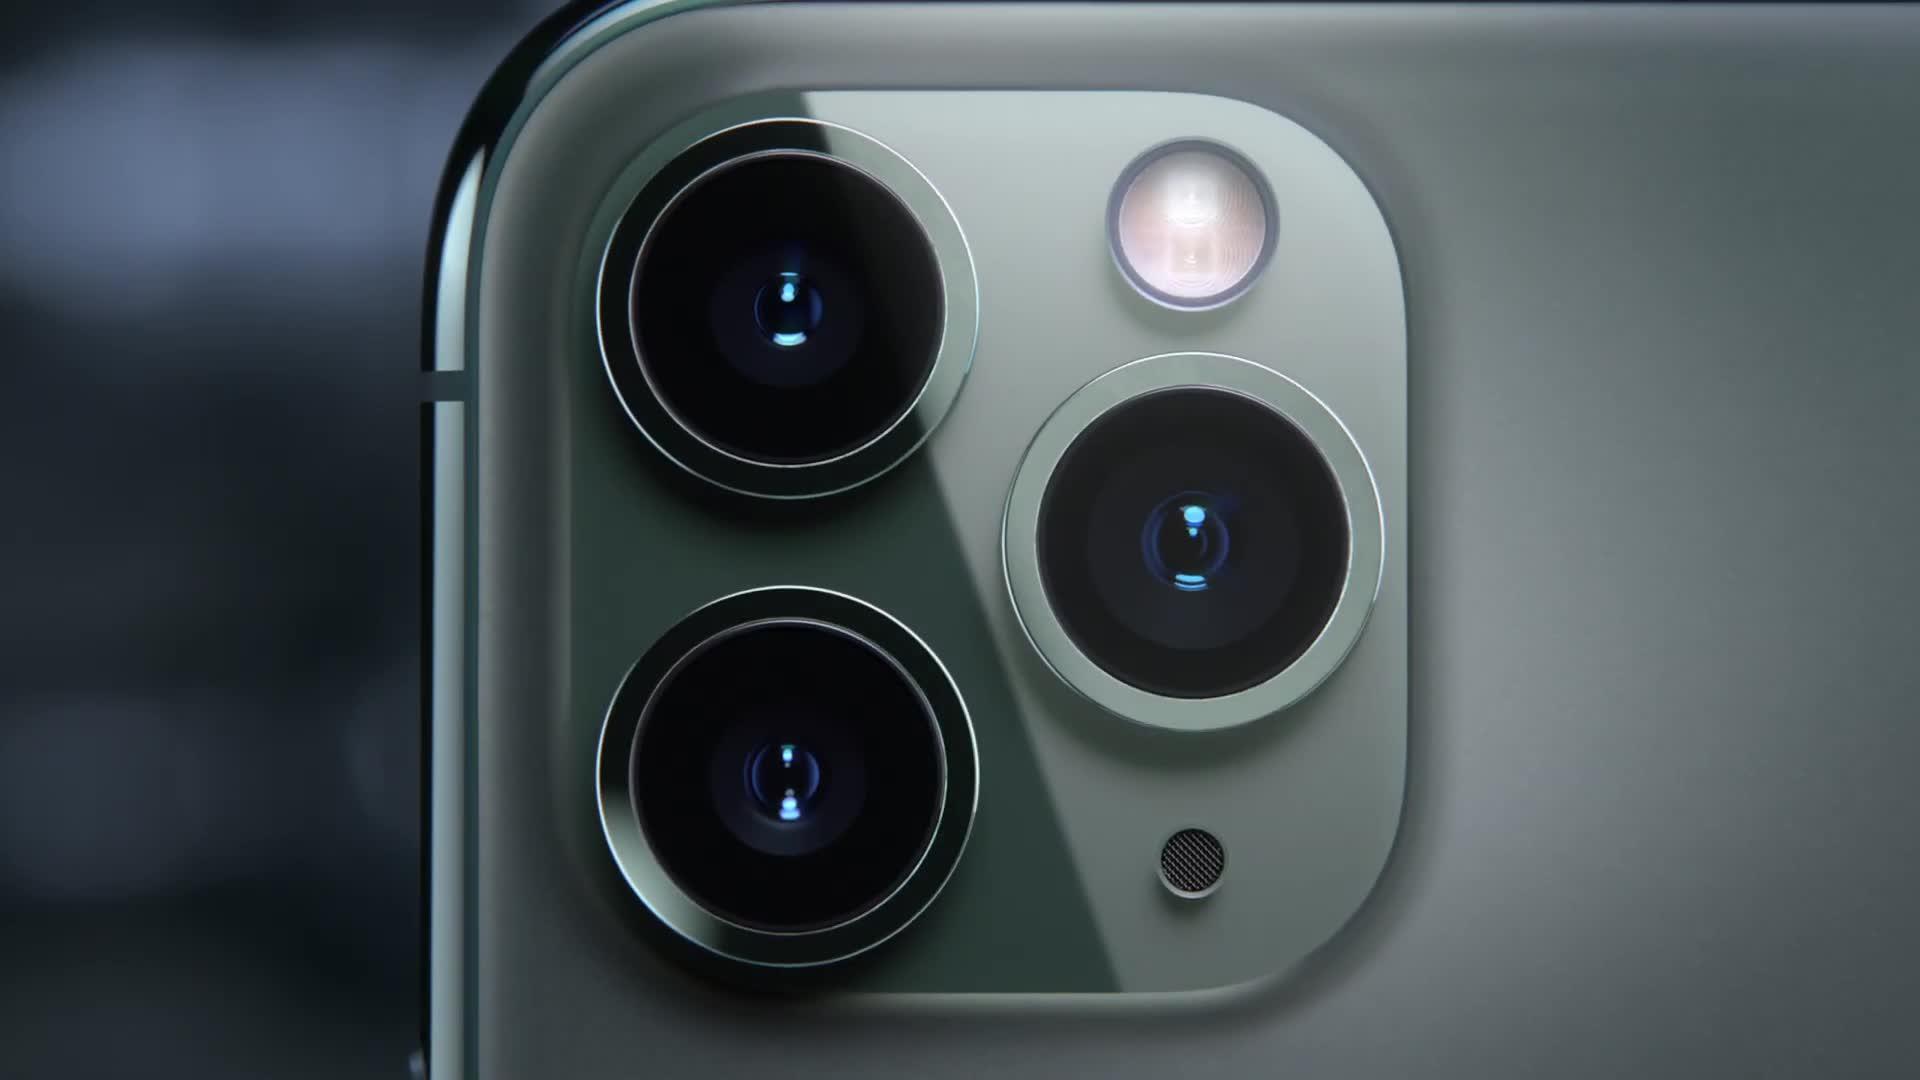 Smartphone, Apple, iPhone 11, iPhone 11 Pro, Apple iPhone 11 Pro